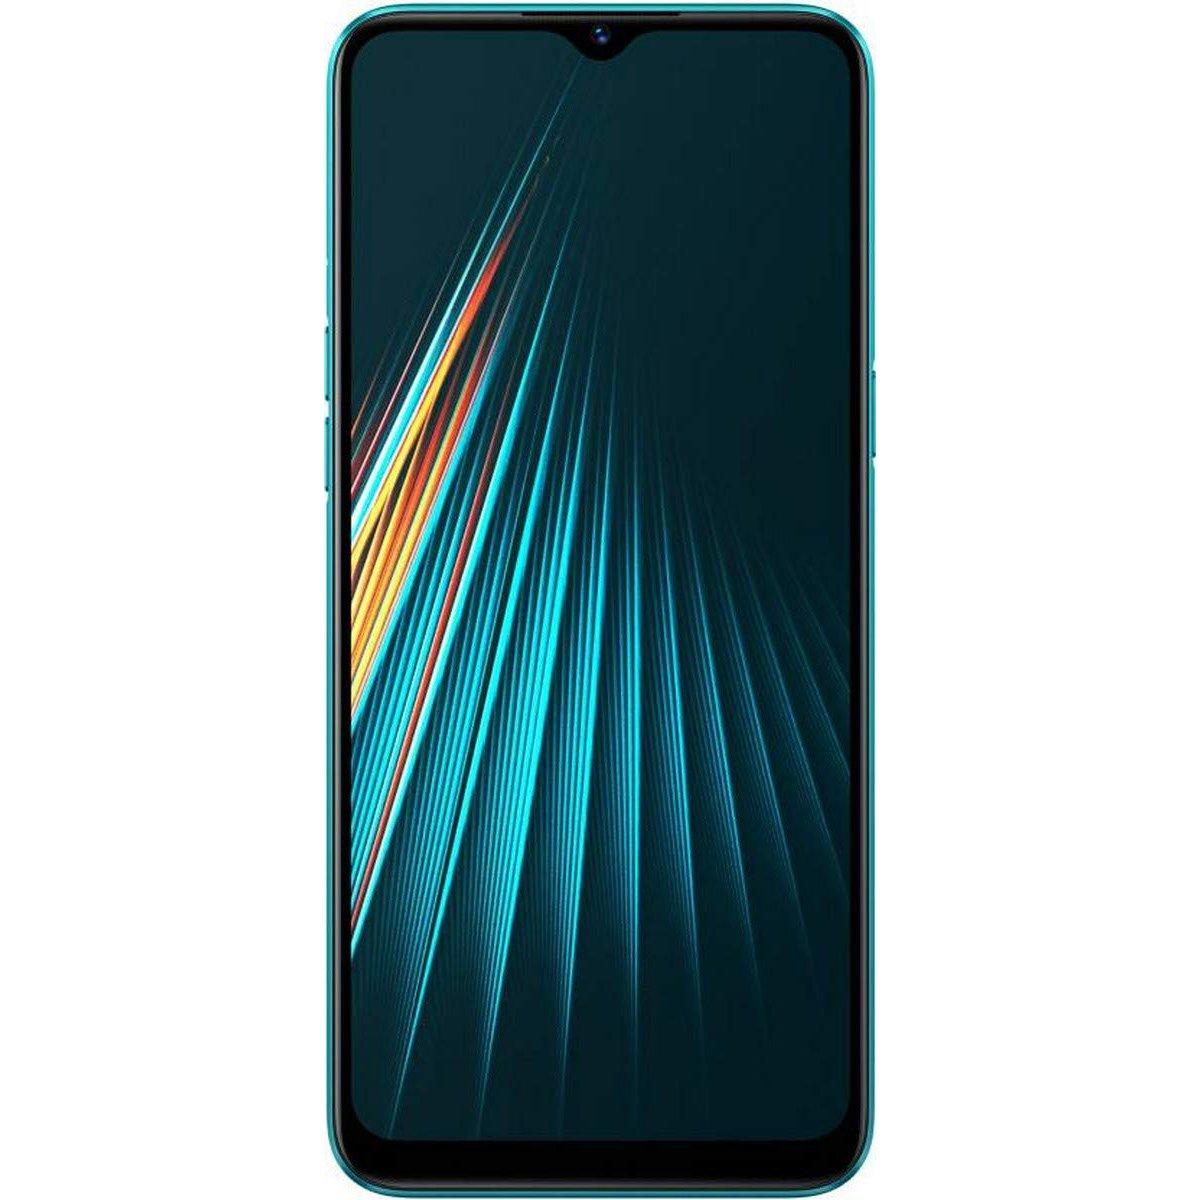 Telefon mobil Realme 5i, Dual SIM, 64GB, 4GB RAM, 4G, Aqua Blue